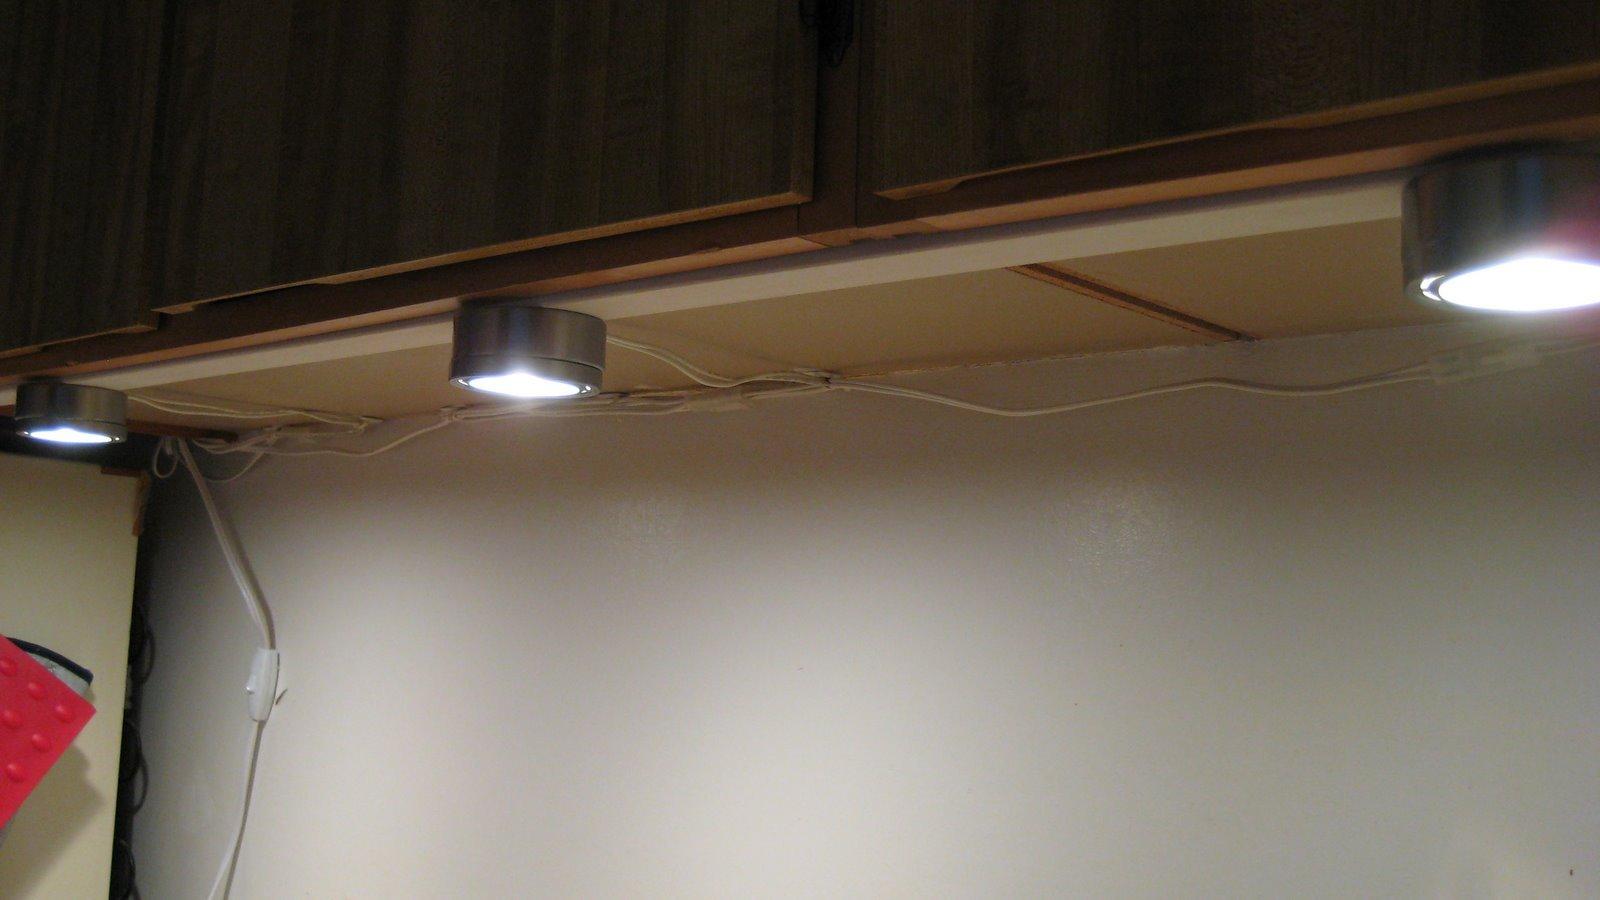 Jugendzimmer Ikea Preisliste ~ Improve your kitchen counter lighting  IKEA Hackers  IKEA Hackers